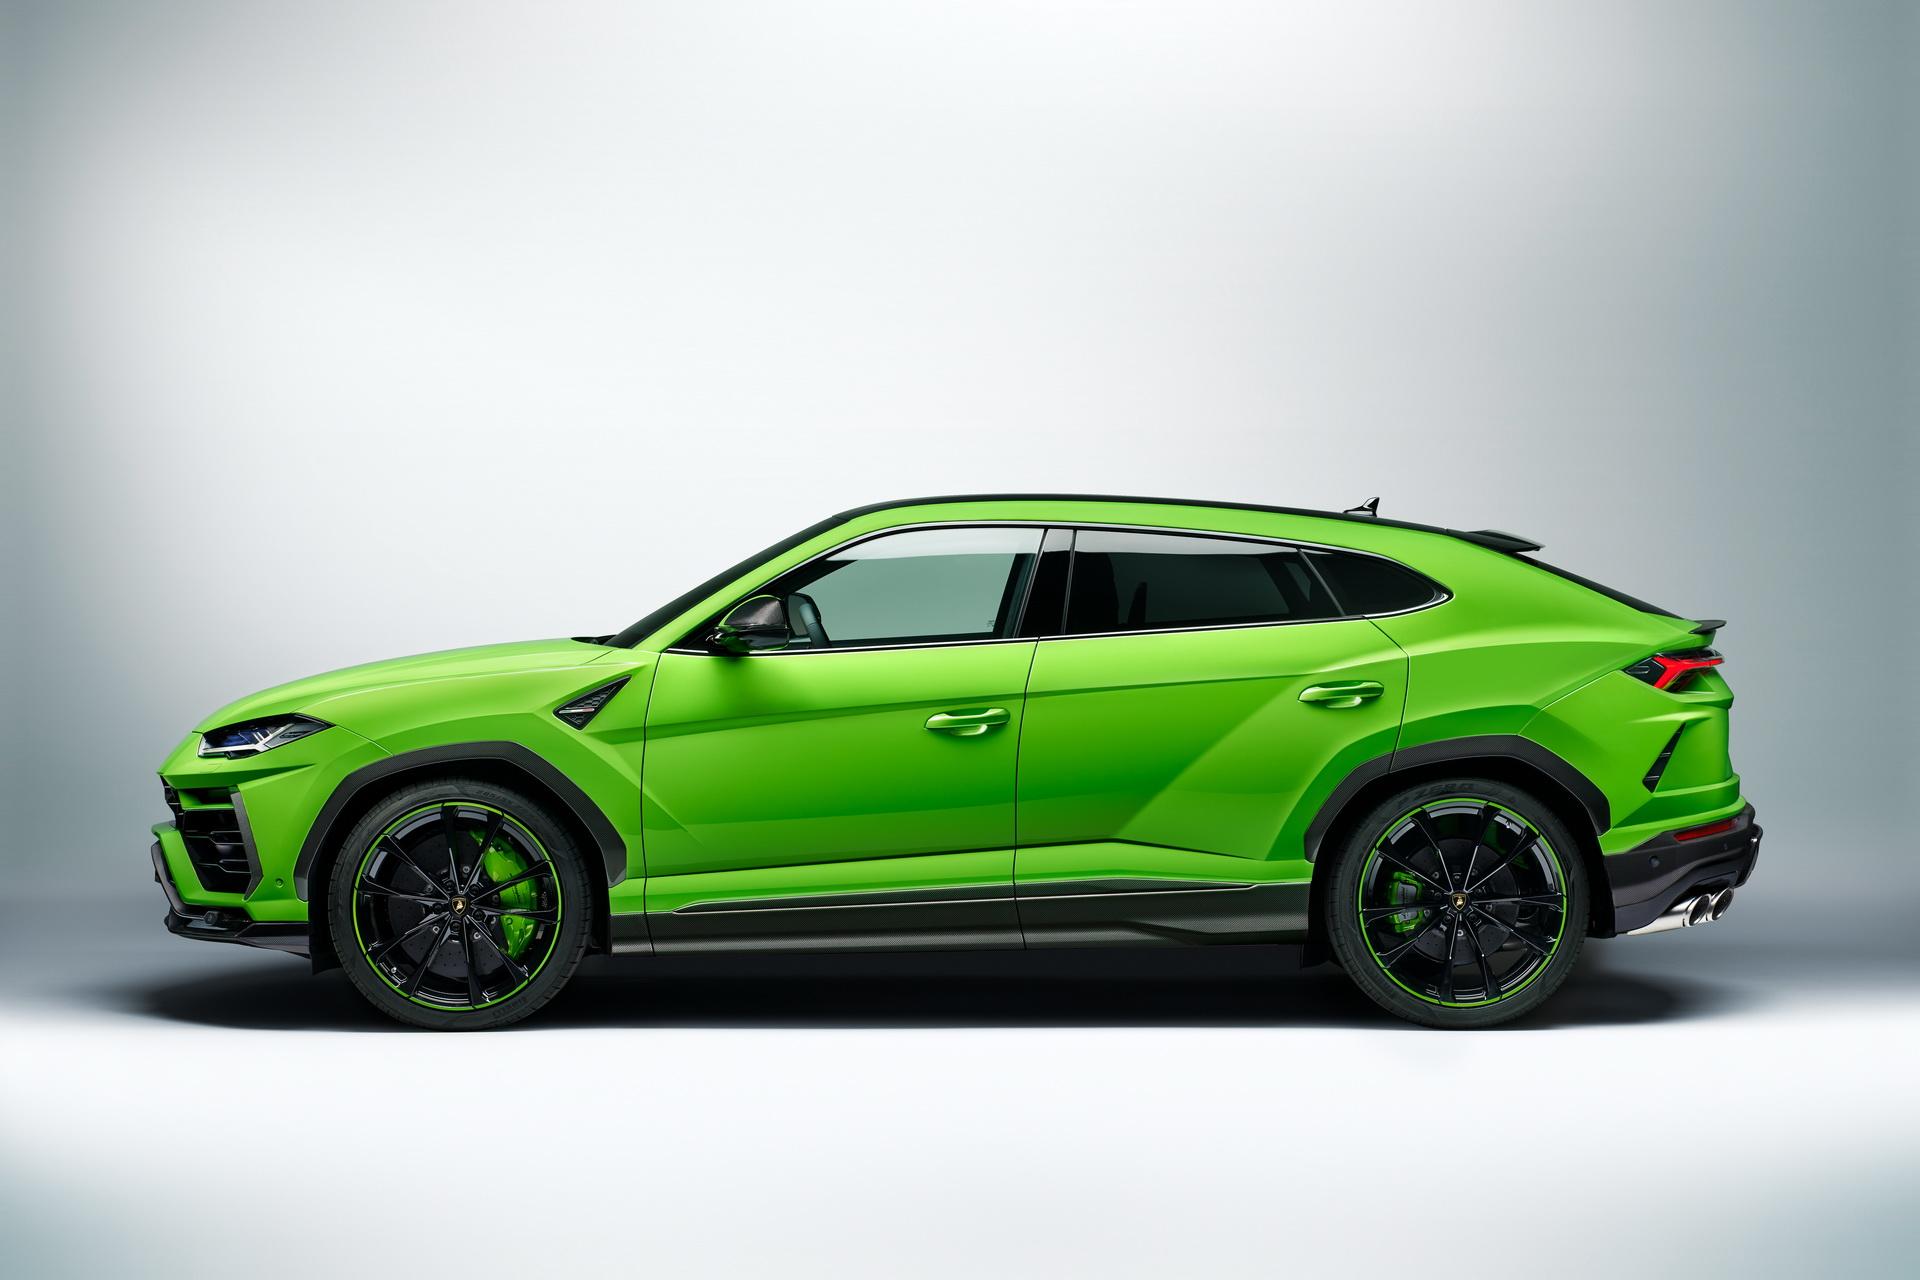 Lamborghini-Urus-Pearl-Capsule-Edition-5